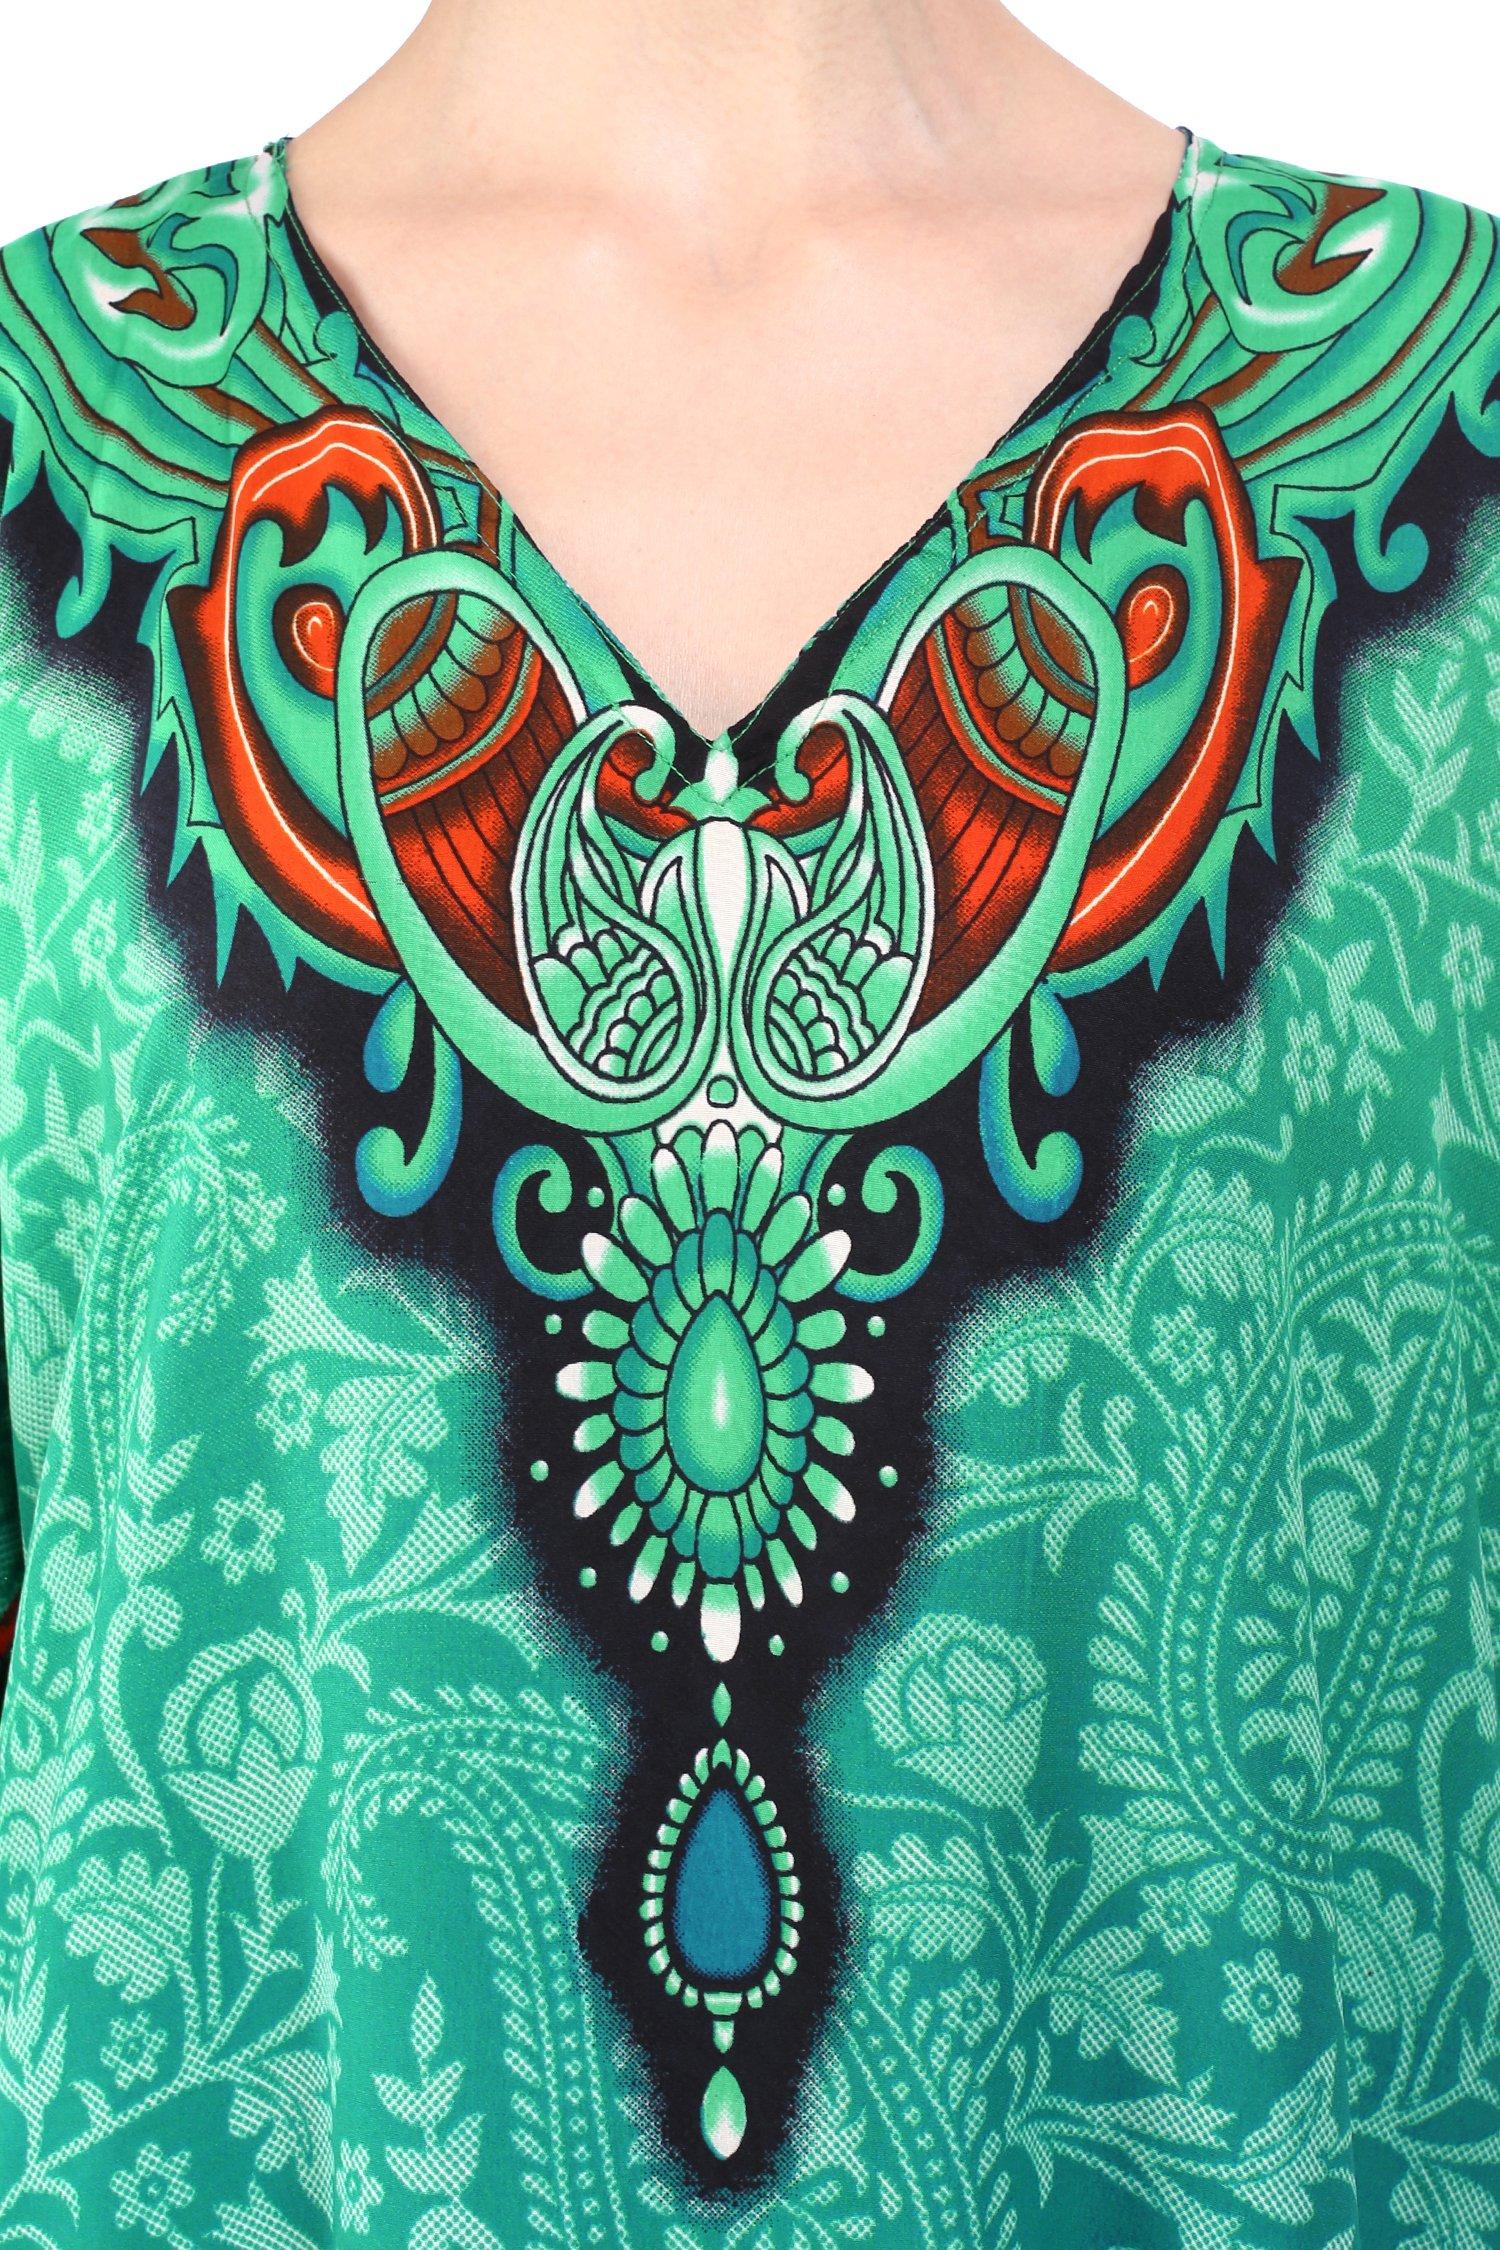 Miss Lavish London Women Kaftan Tunic Kimono Free Size Long Maxi Party Dress Loungewear Holidays Nightwear Beach Everyday Cover up Dresses by Miss Lavish London (Image #4)